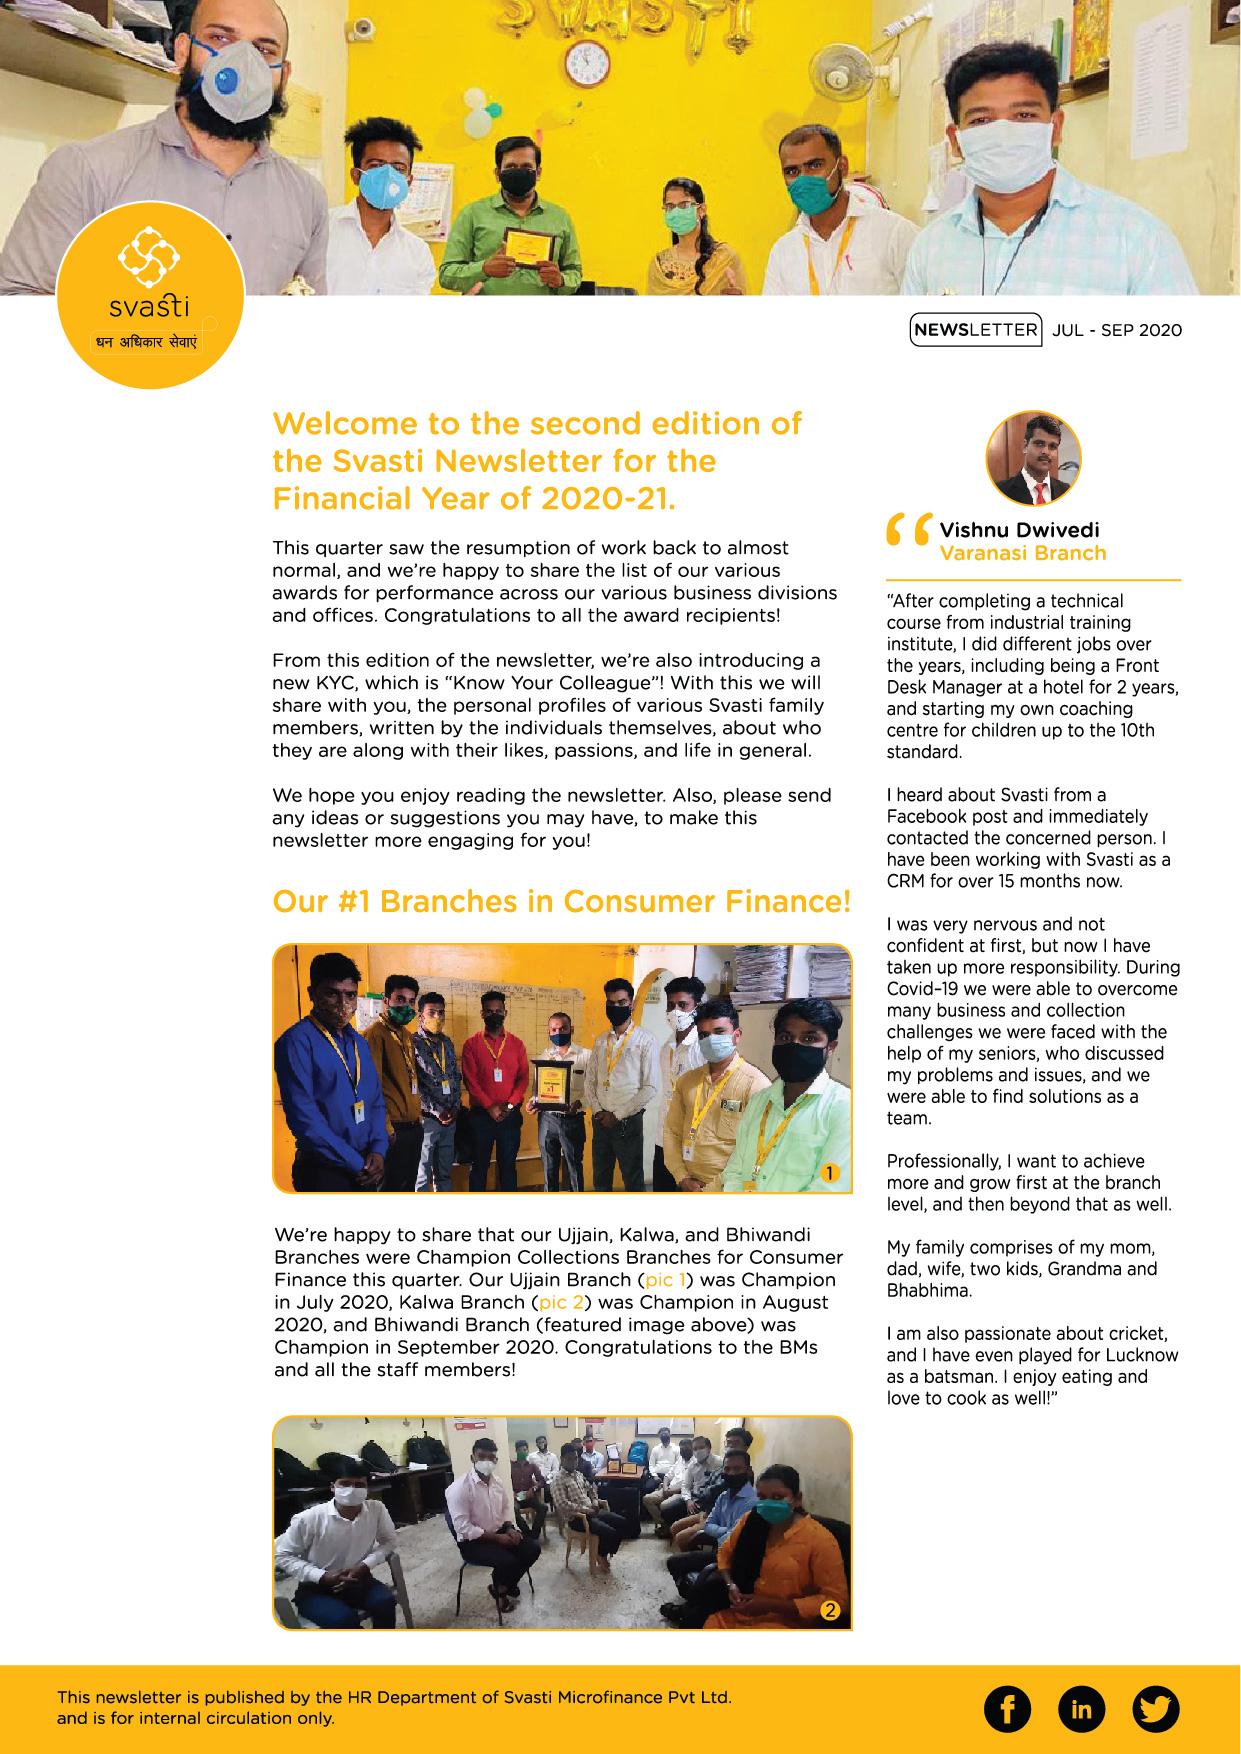 Svasti Newsletter Jul to Sep 2020